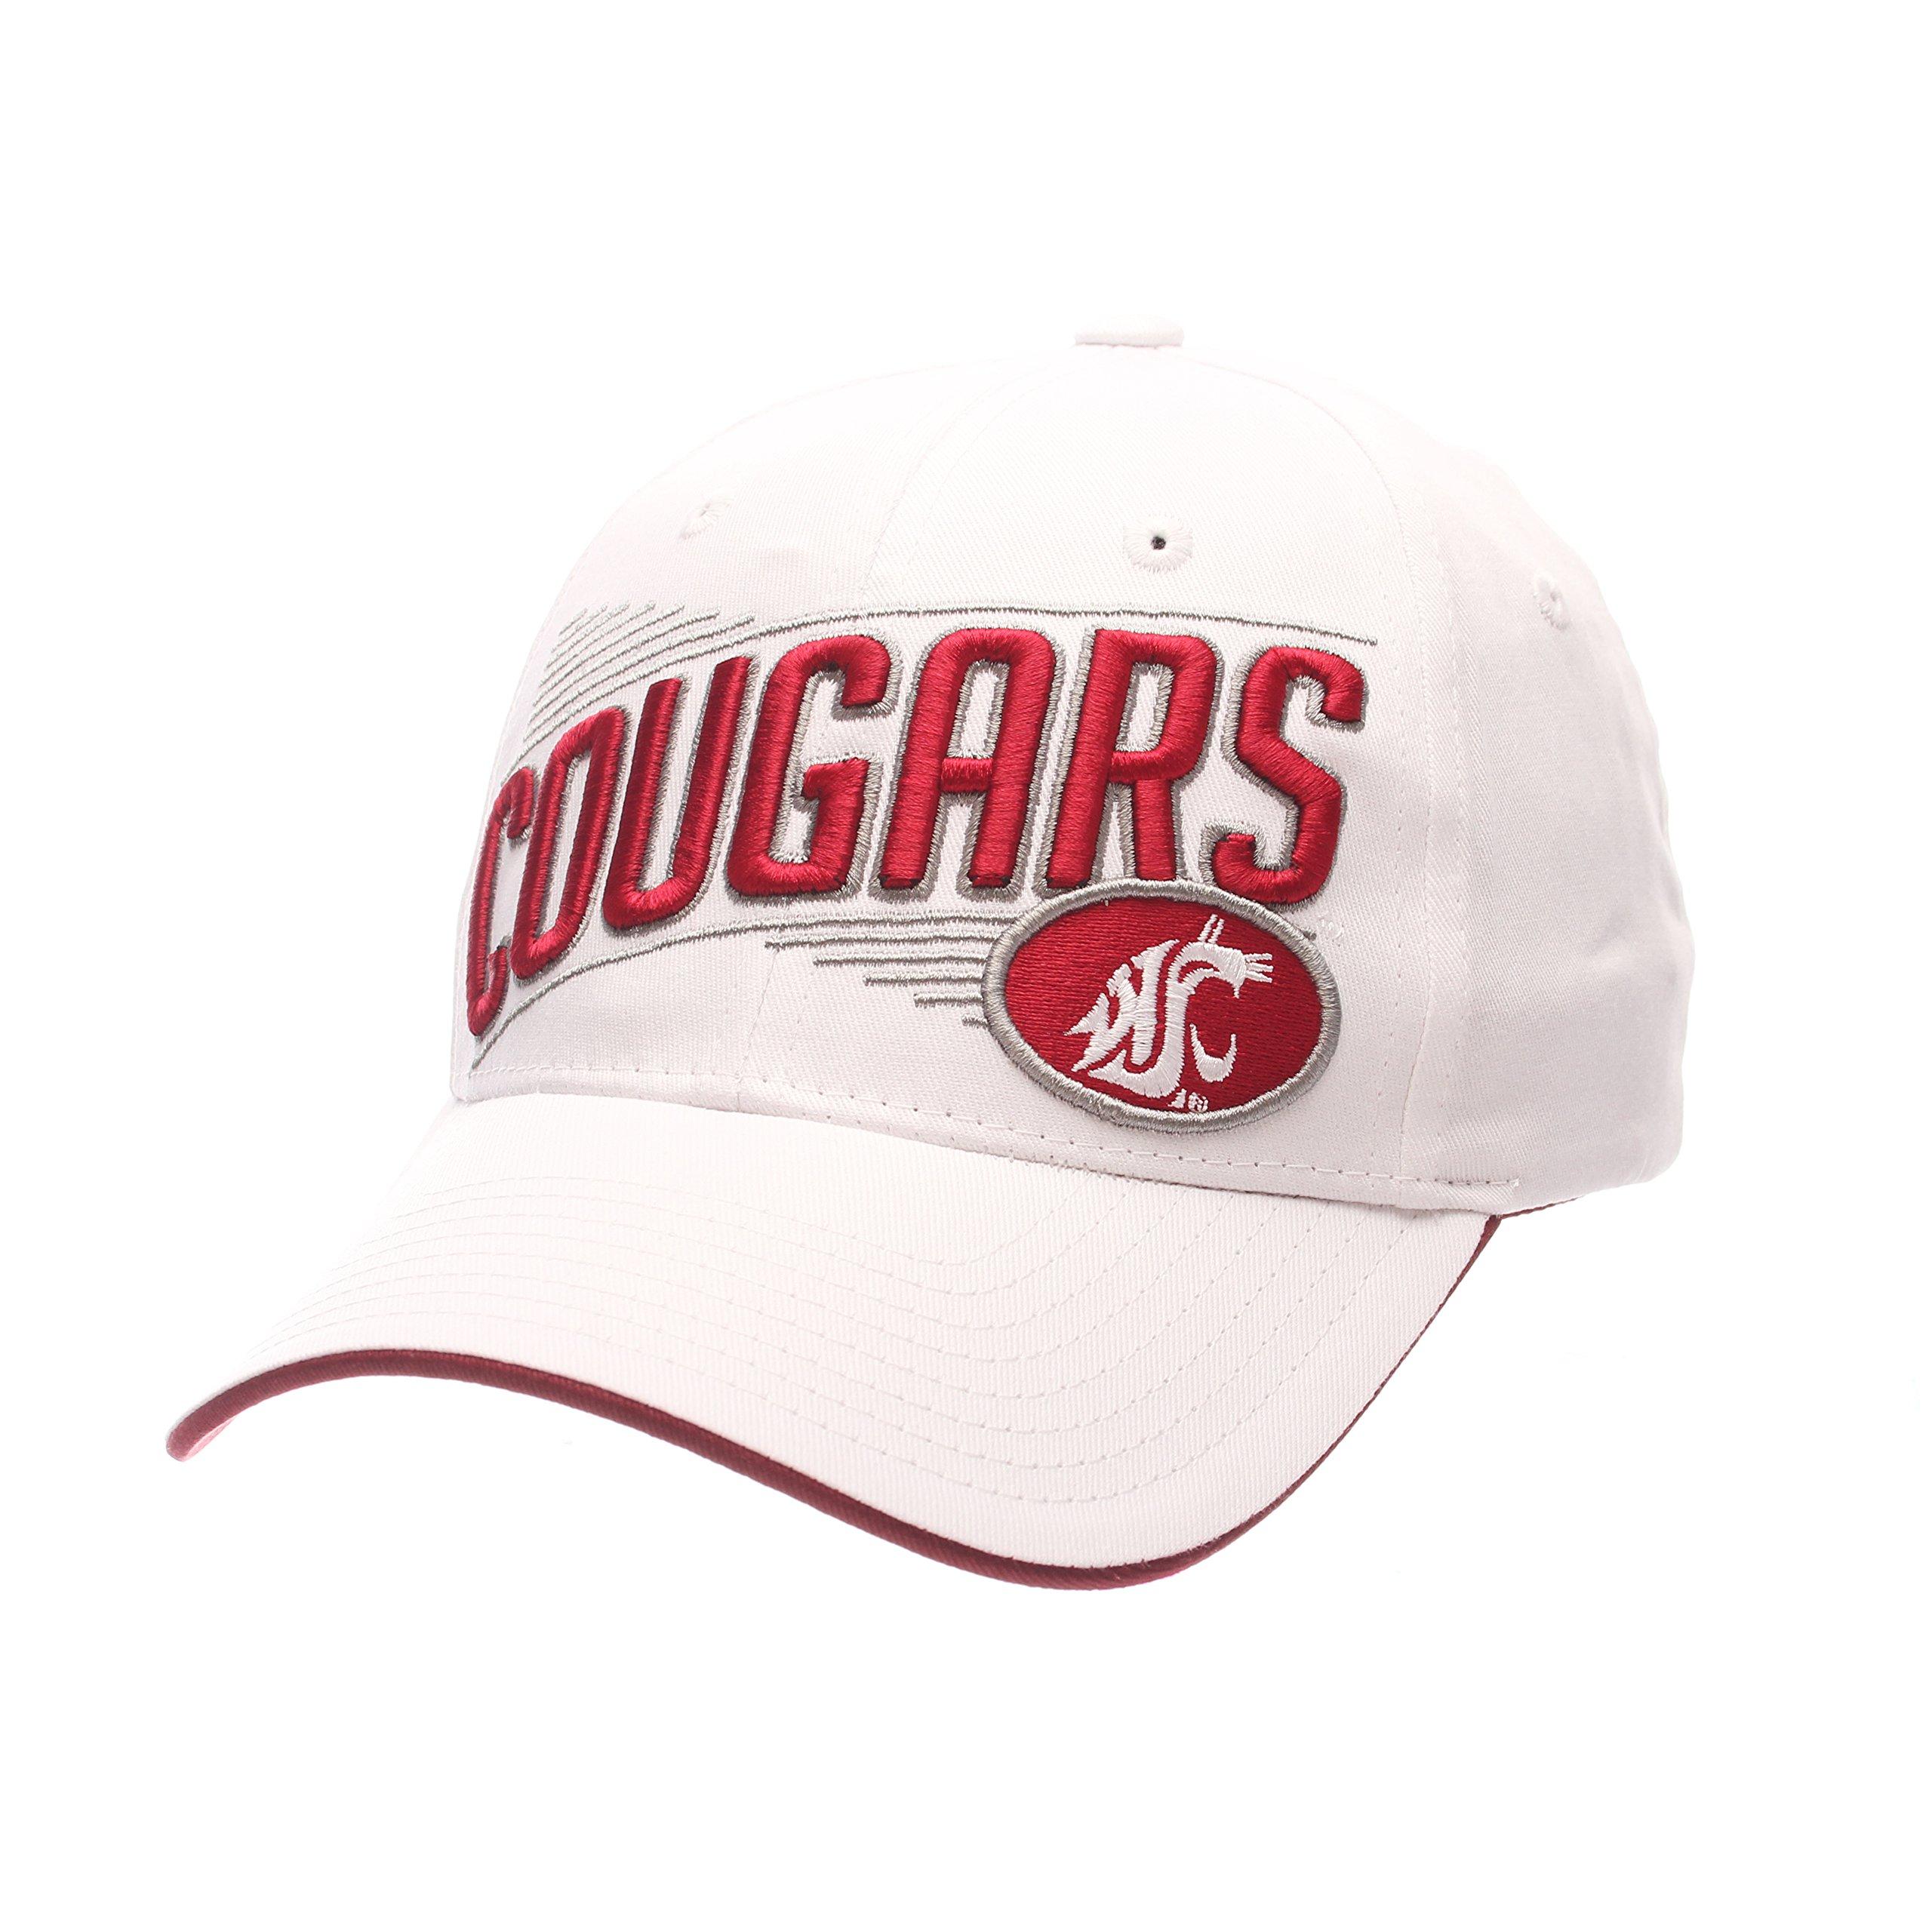 78c8e381d3961 ZHATS NCAA Washington State Cougars Adult Men s Crossover Cap ...